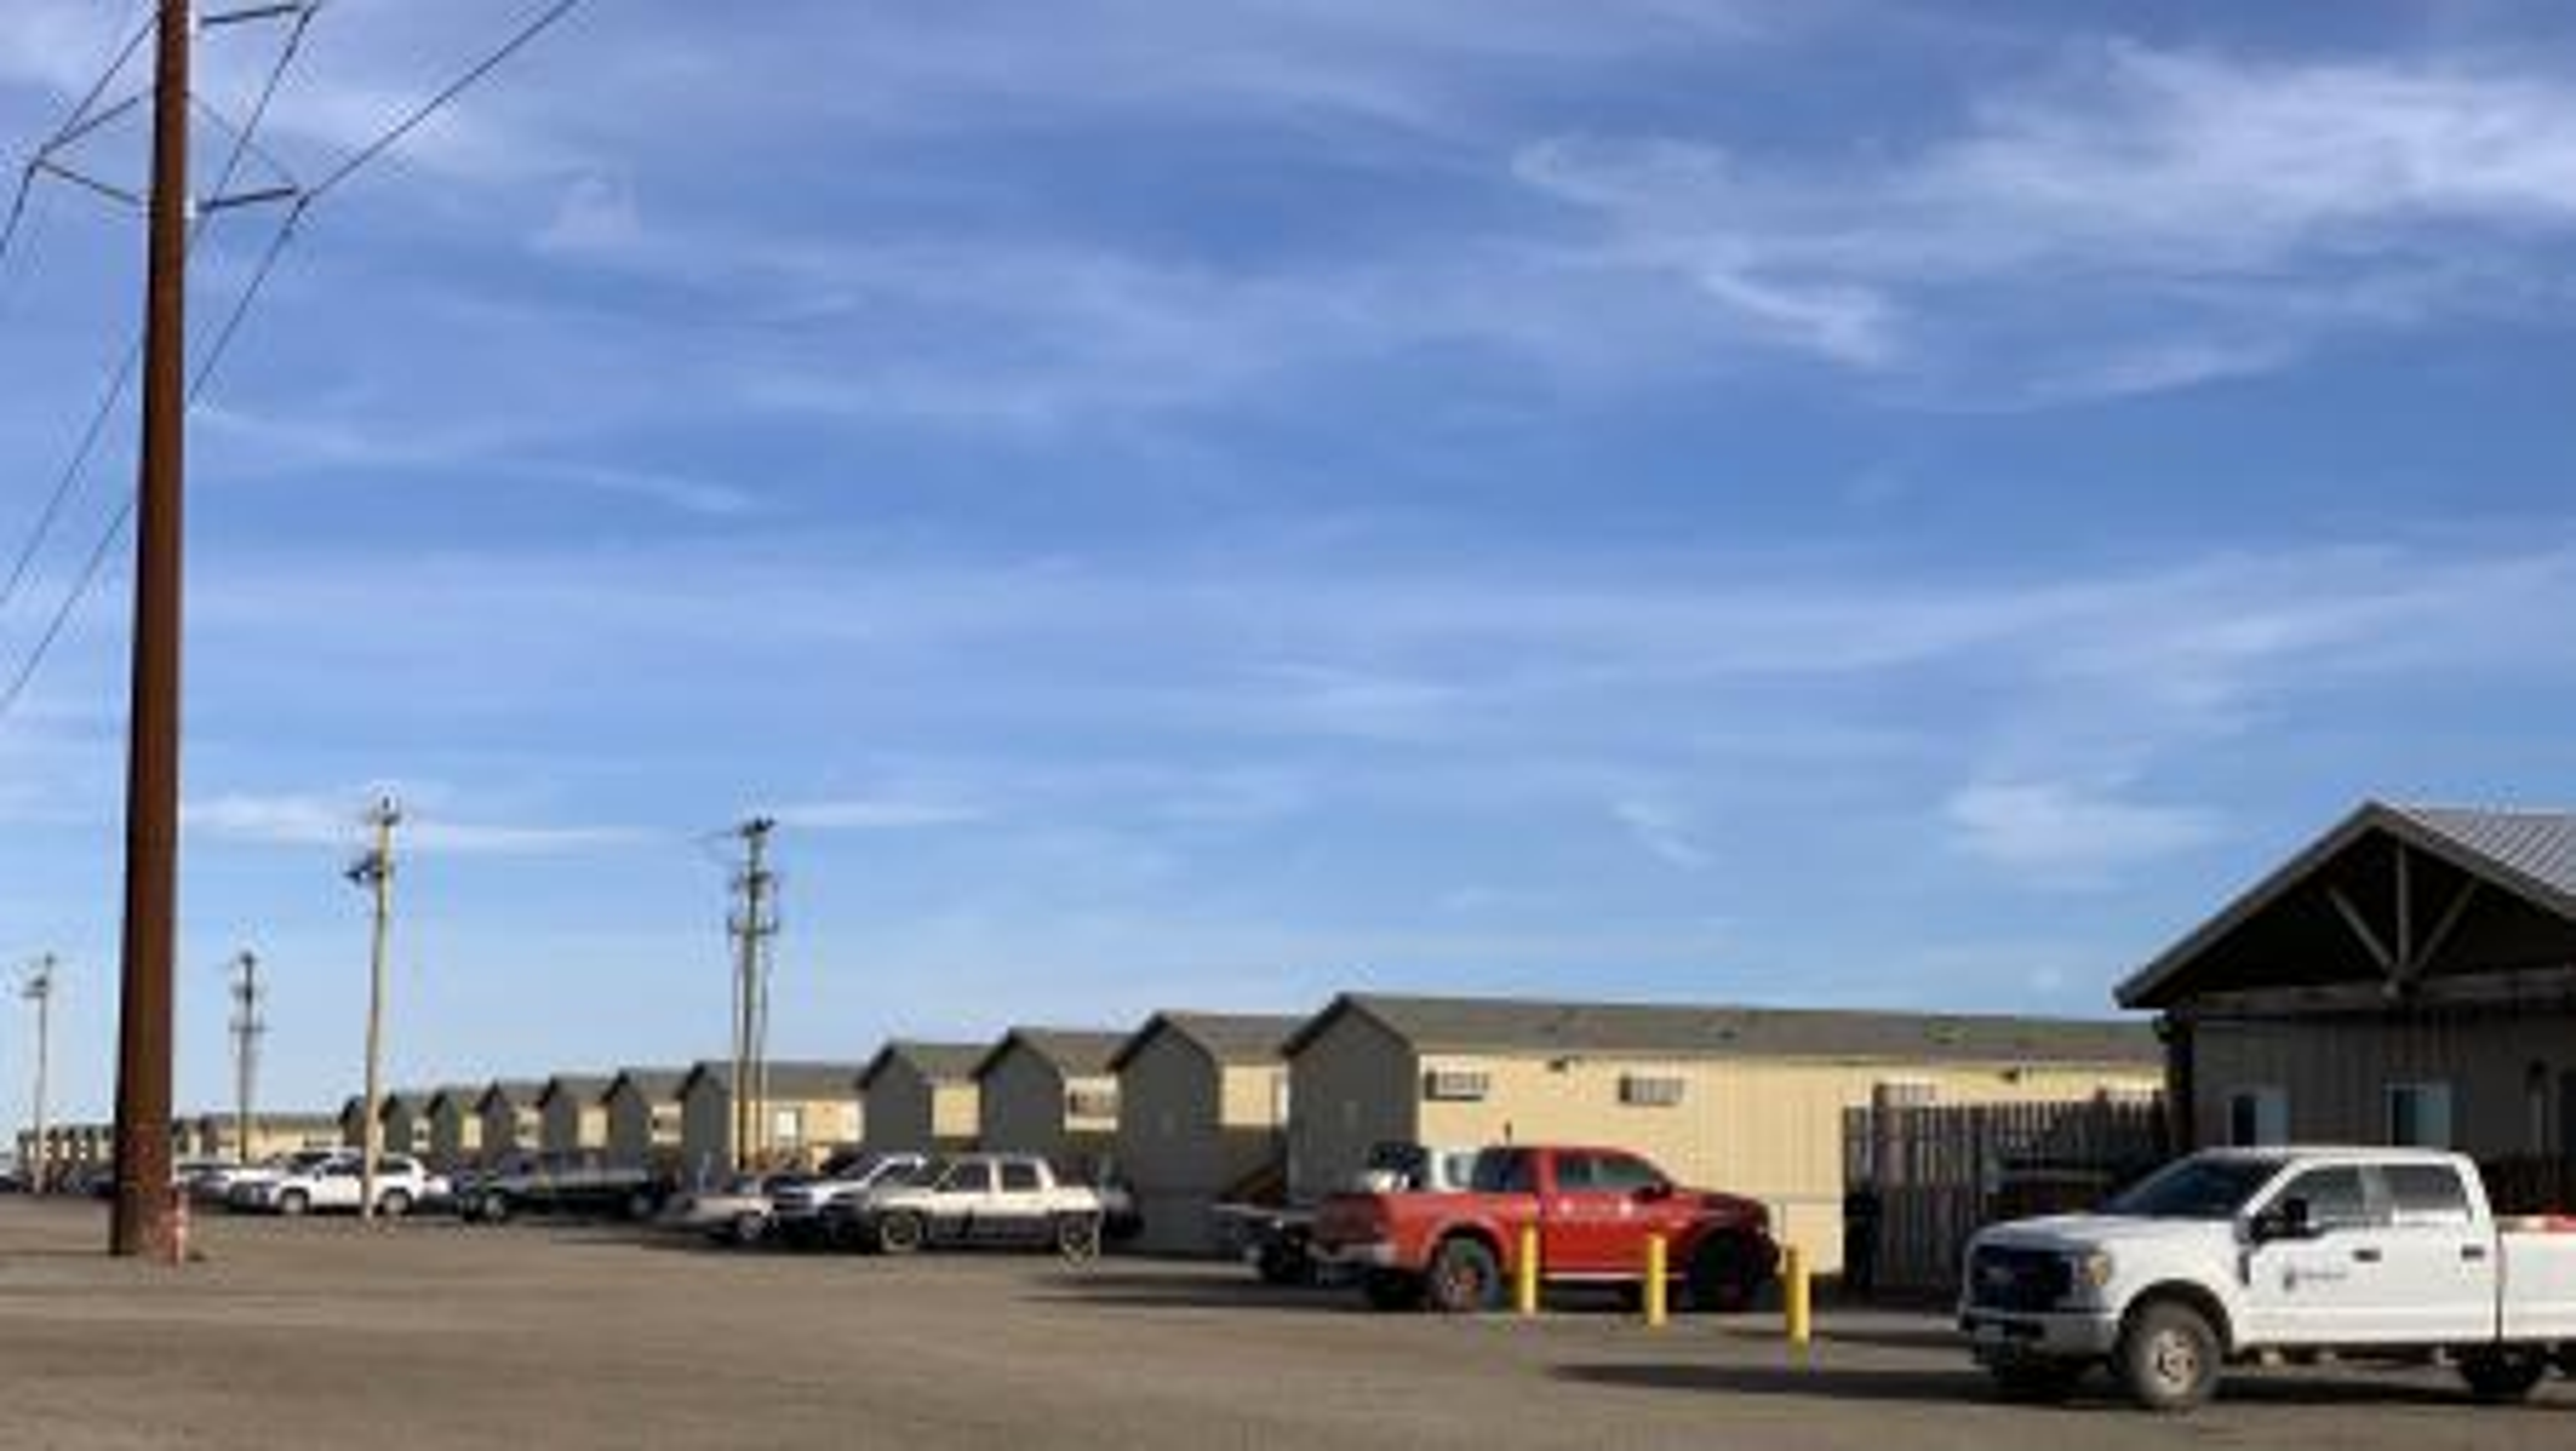 Entrepreneurs thrive on US Highway 285 amid Permian fracking